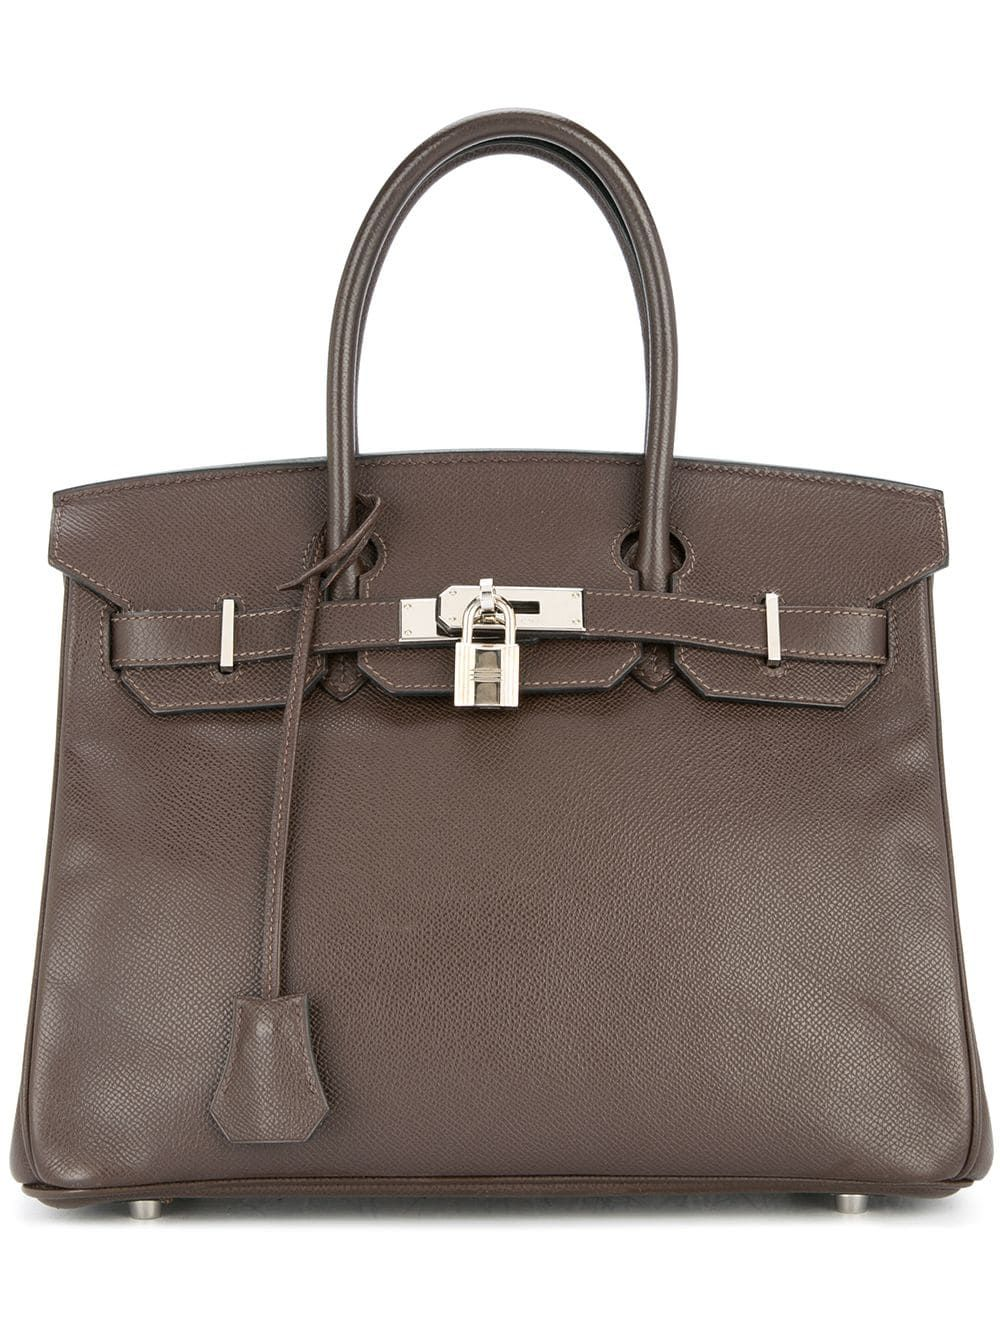 5f395b470f43 Hermès Vintage Сумка 'Birkin 30' в 2019 г. | bags | Hermes birkin ...